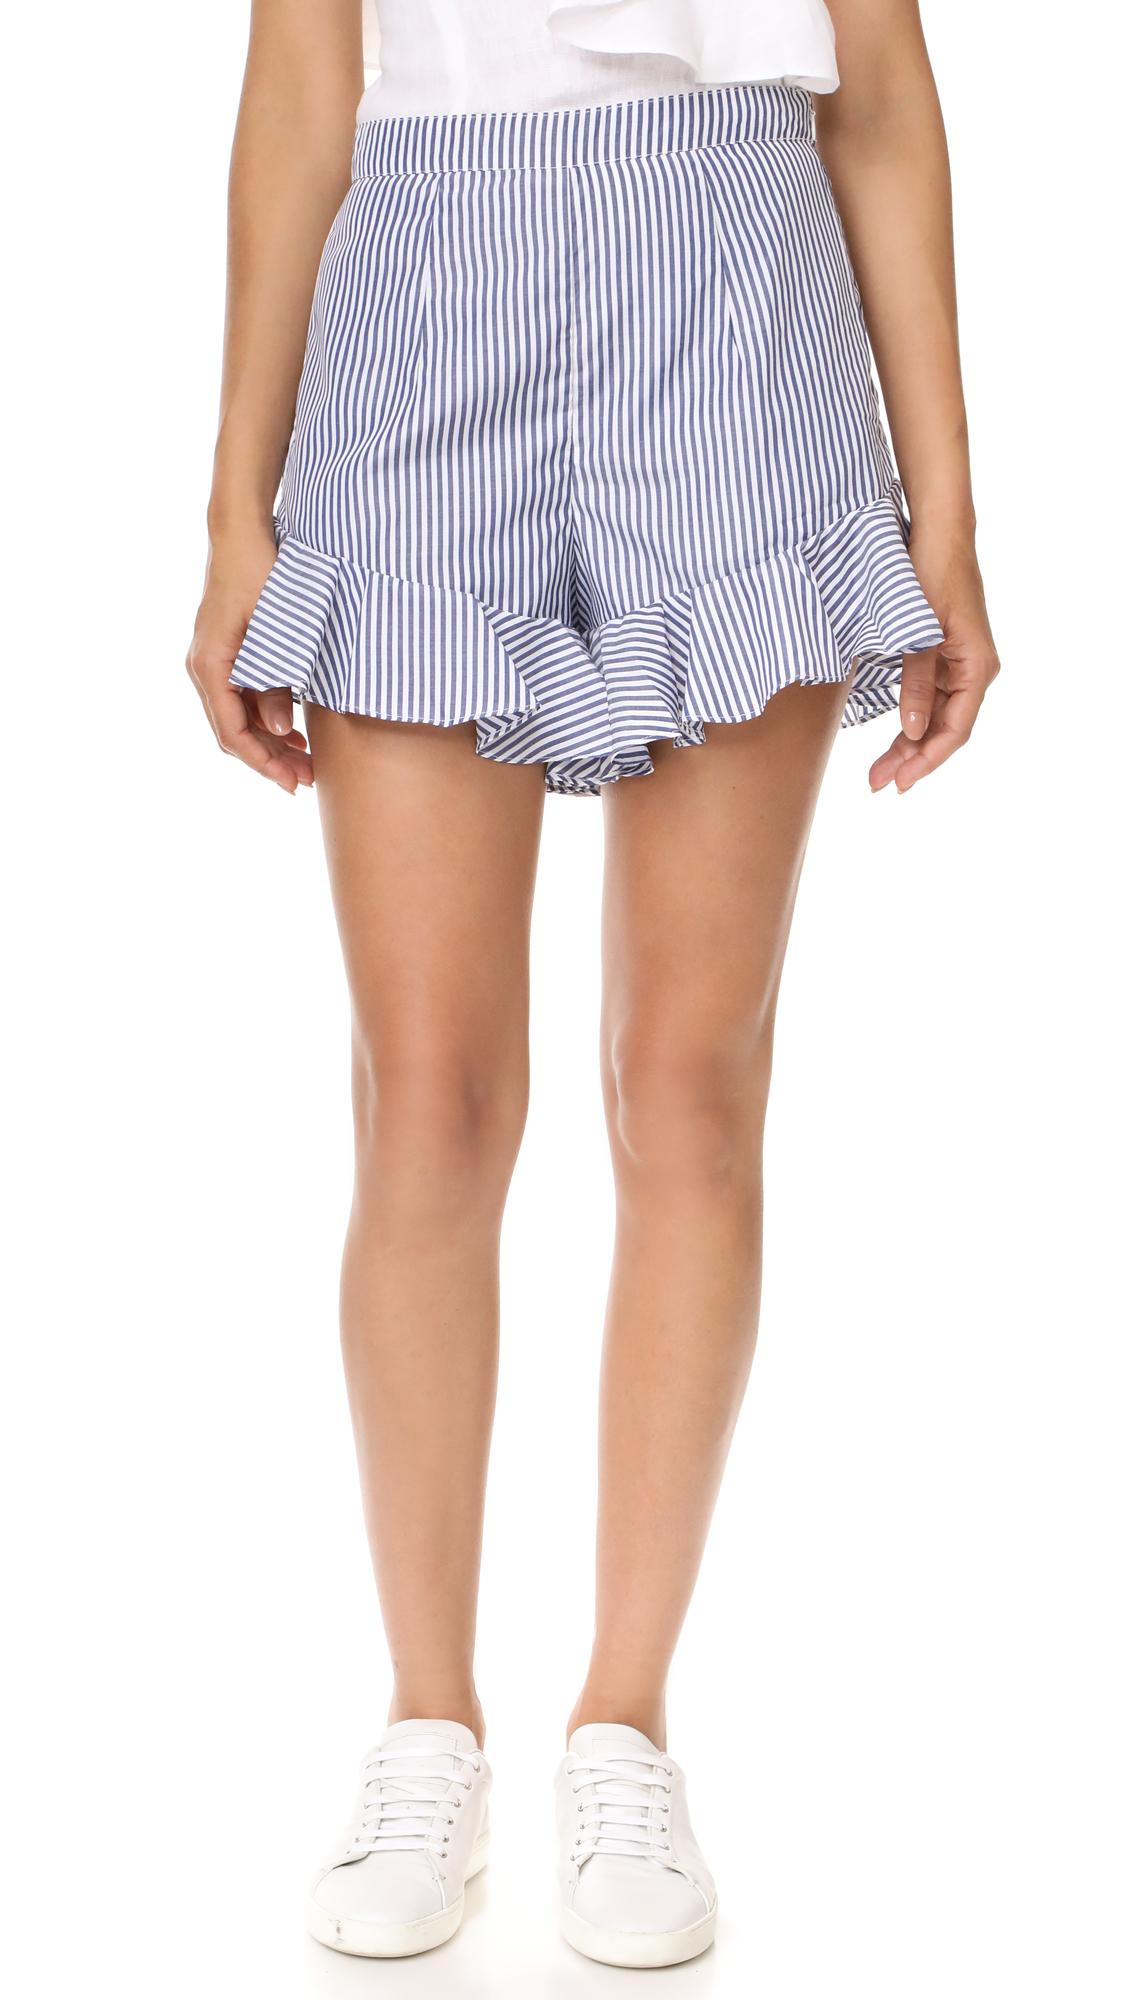 MLM LABEL Jett Ruffle Shorts - Dusted Blue Stripe